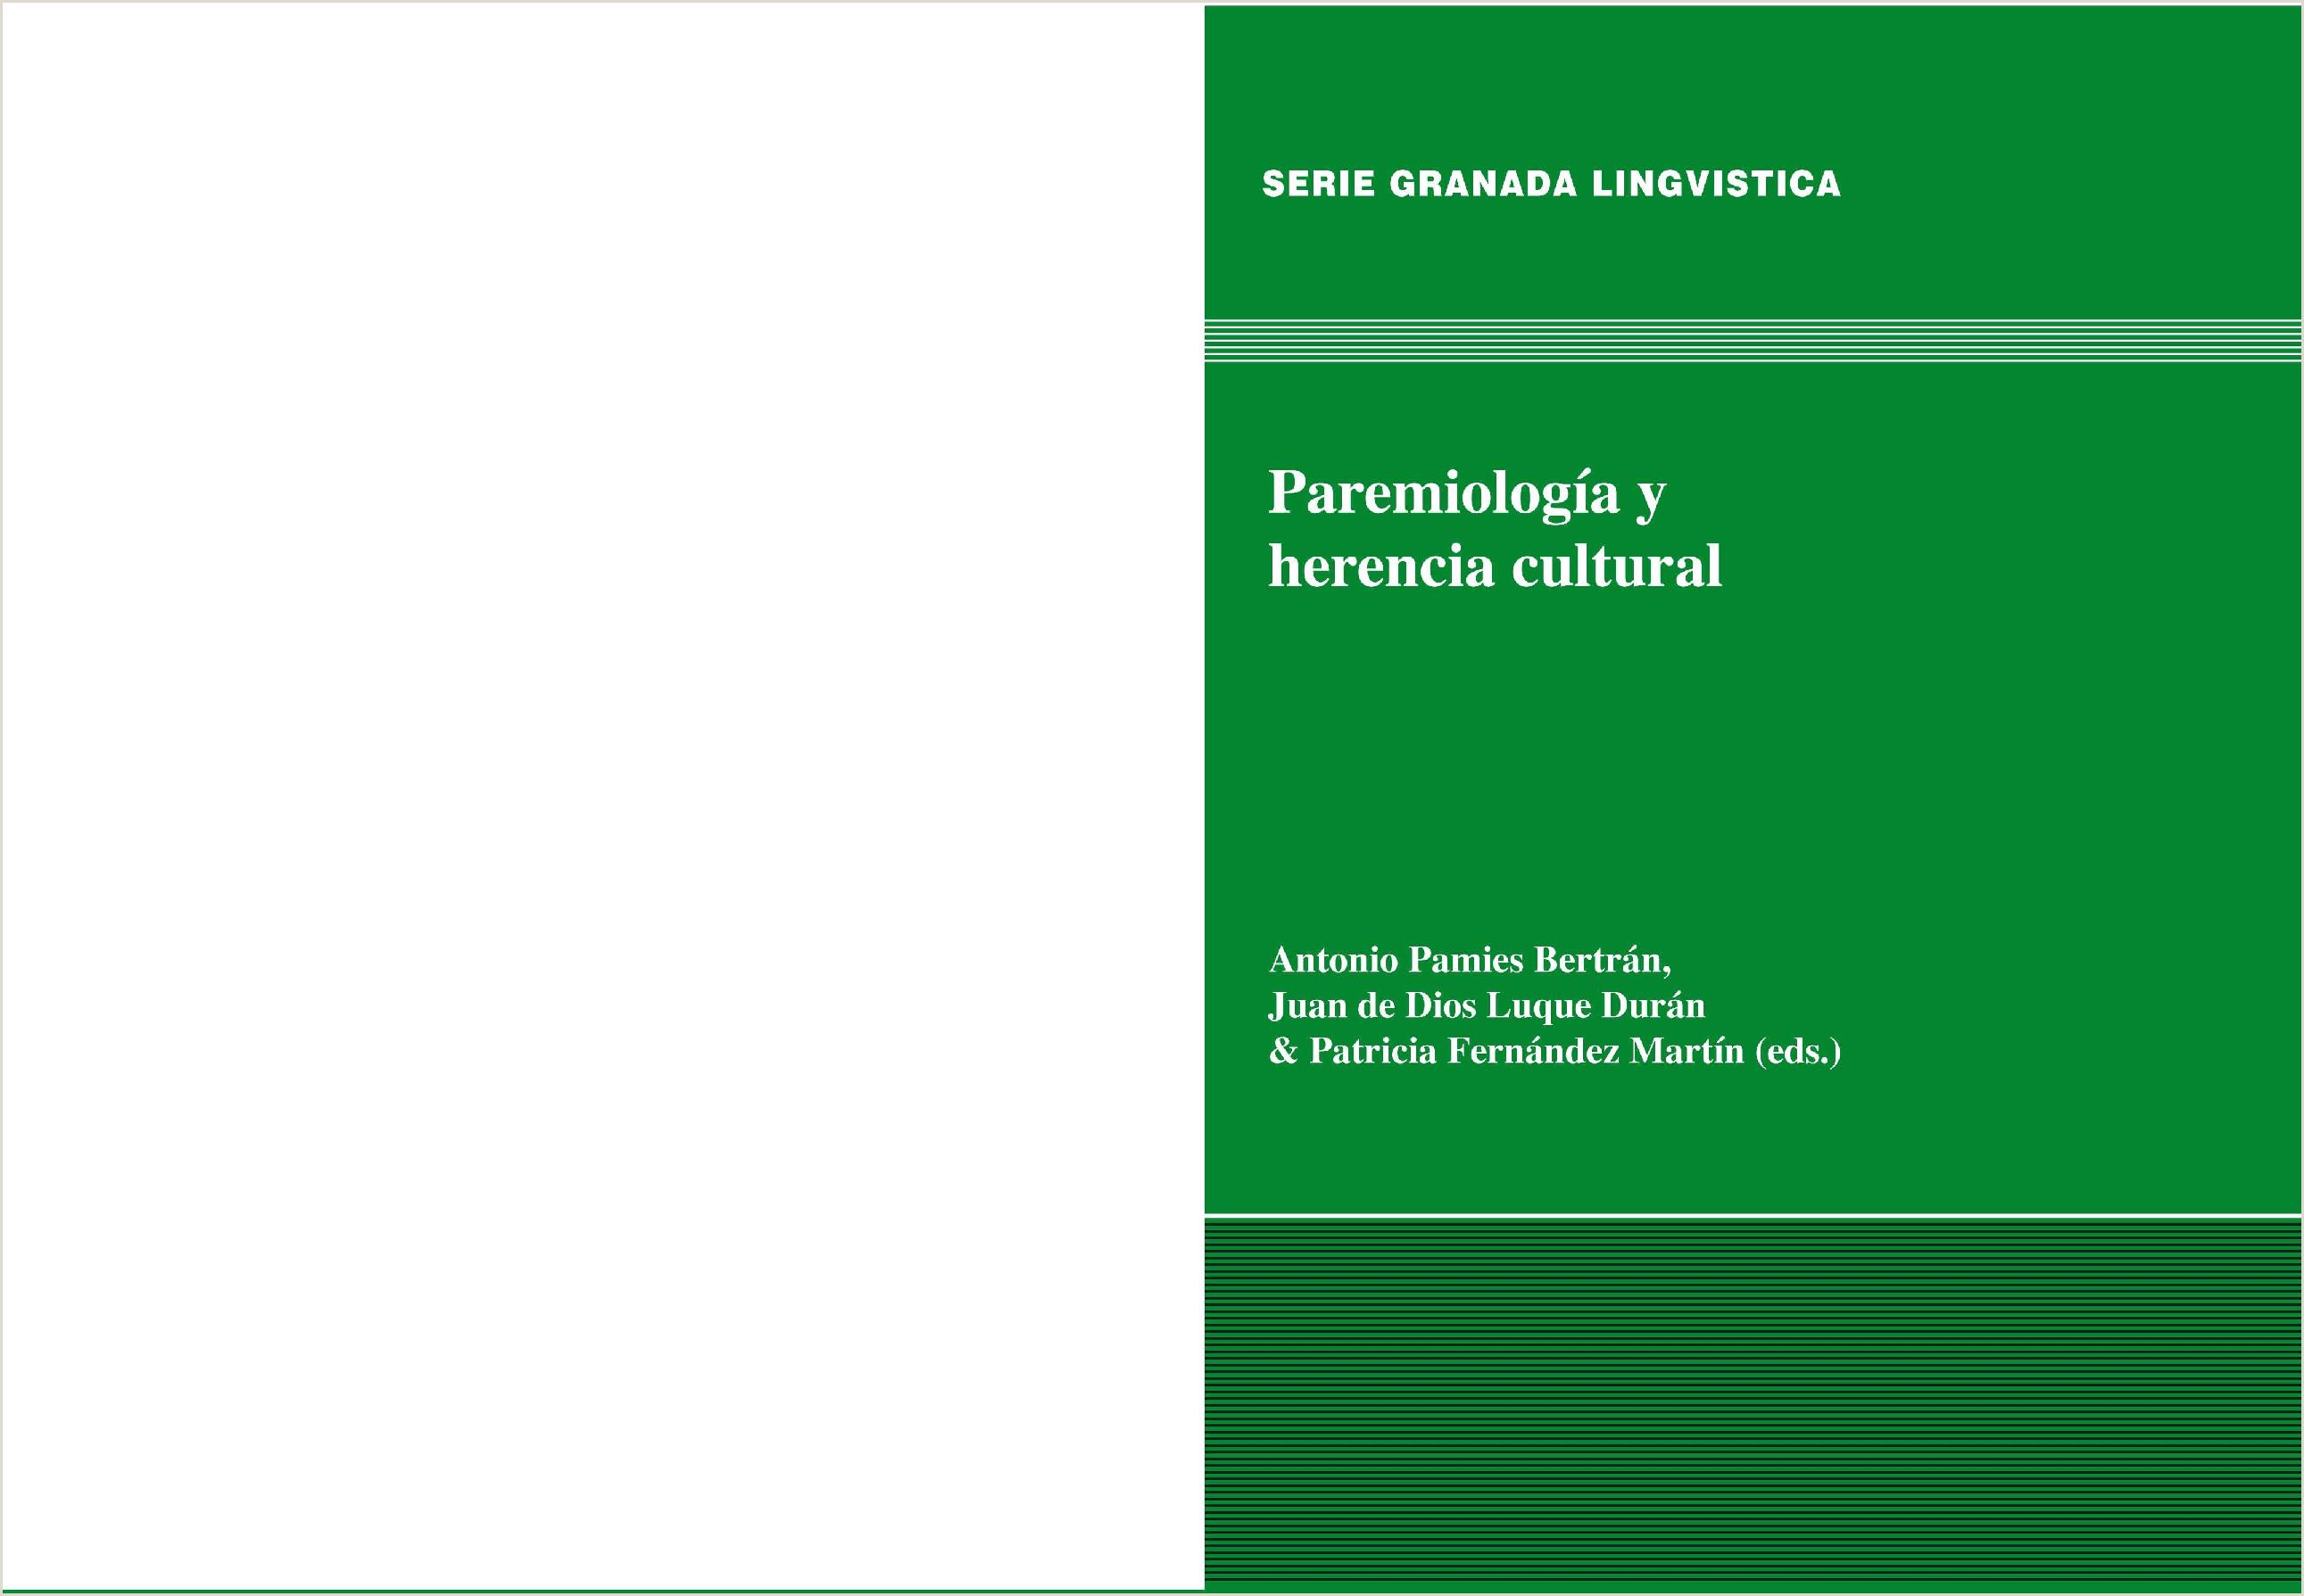 PDF PAMIES A LUQUE DURN J d D & FERNNDEZ MARTN P